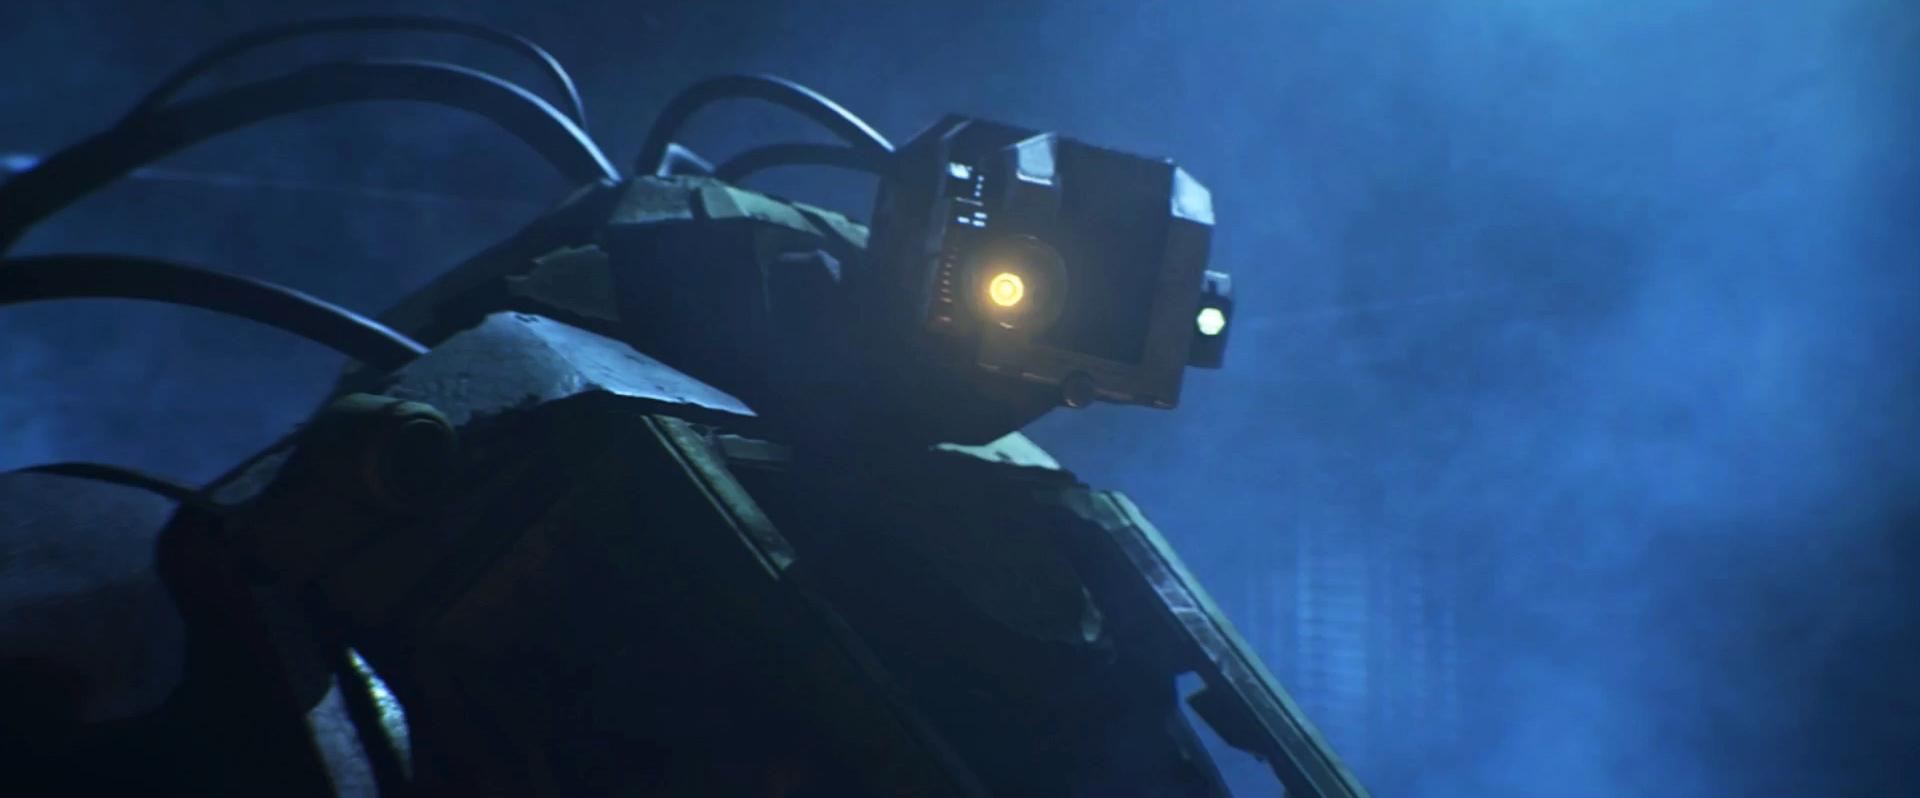 amazingly-cool-sci-fi-short-film-azarkant-6.jpg